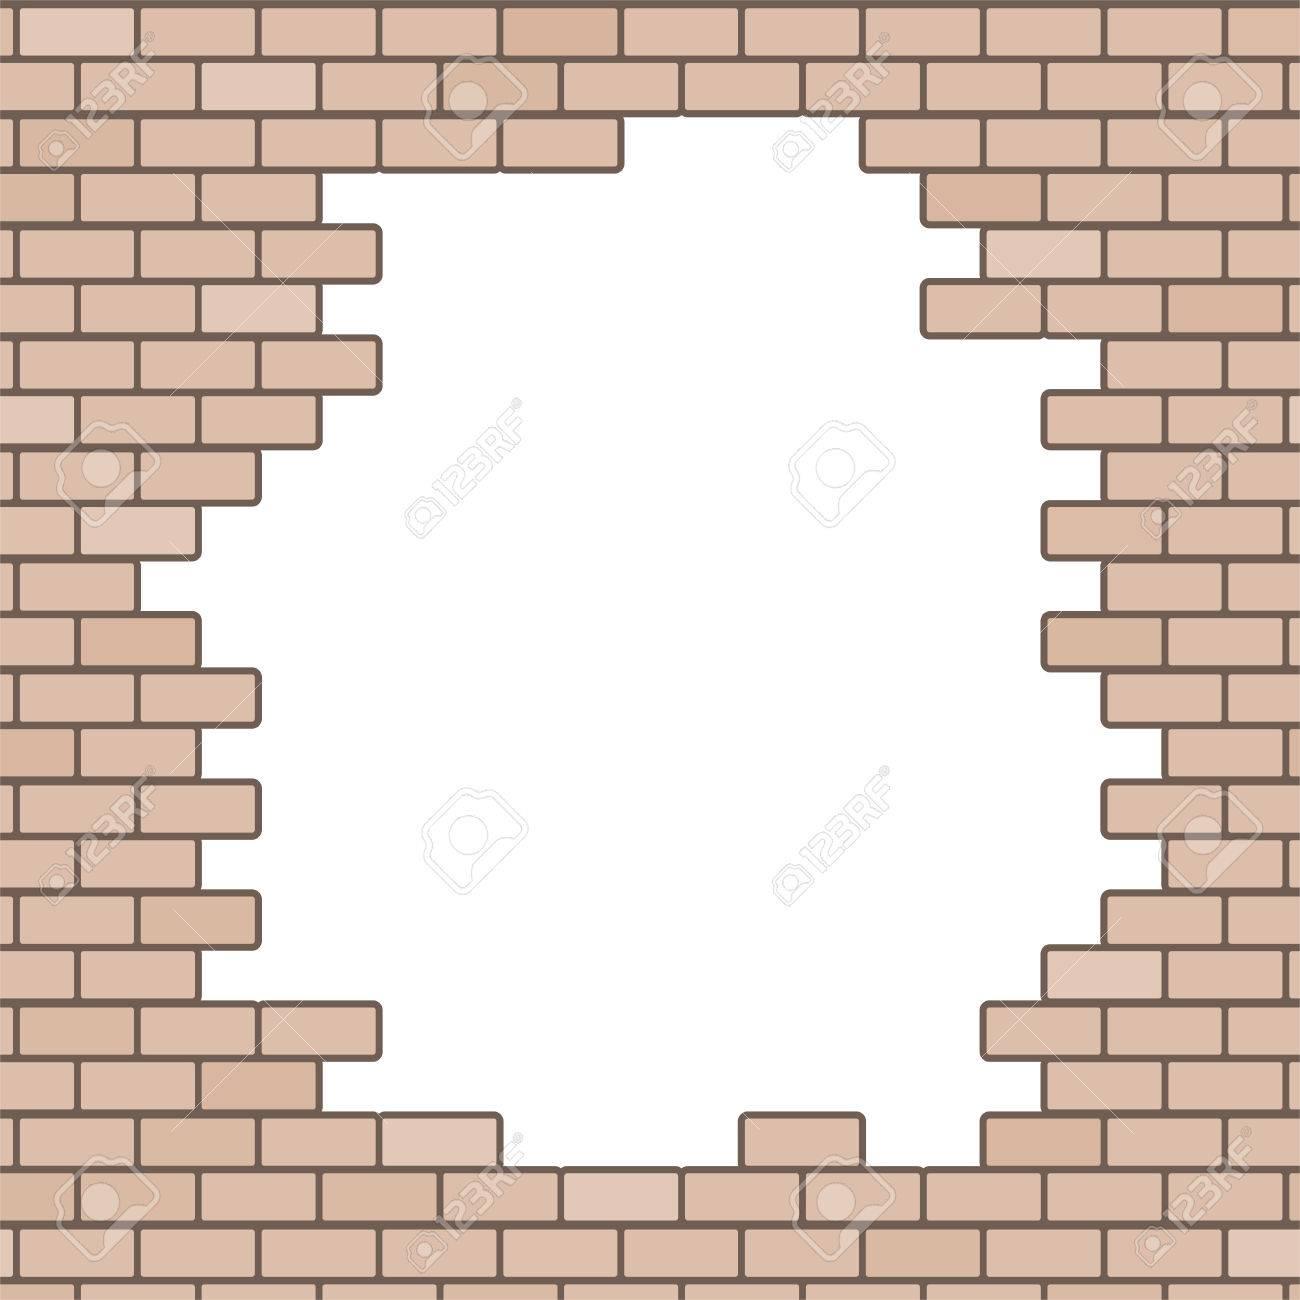 broken brick wall background.